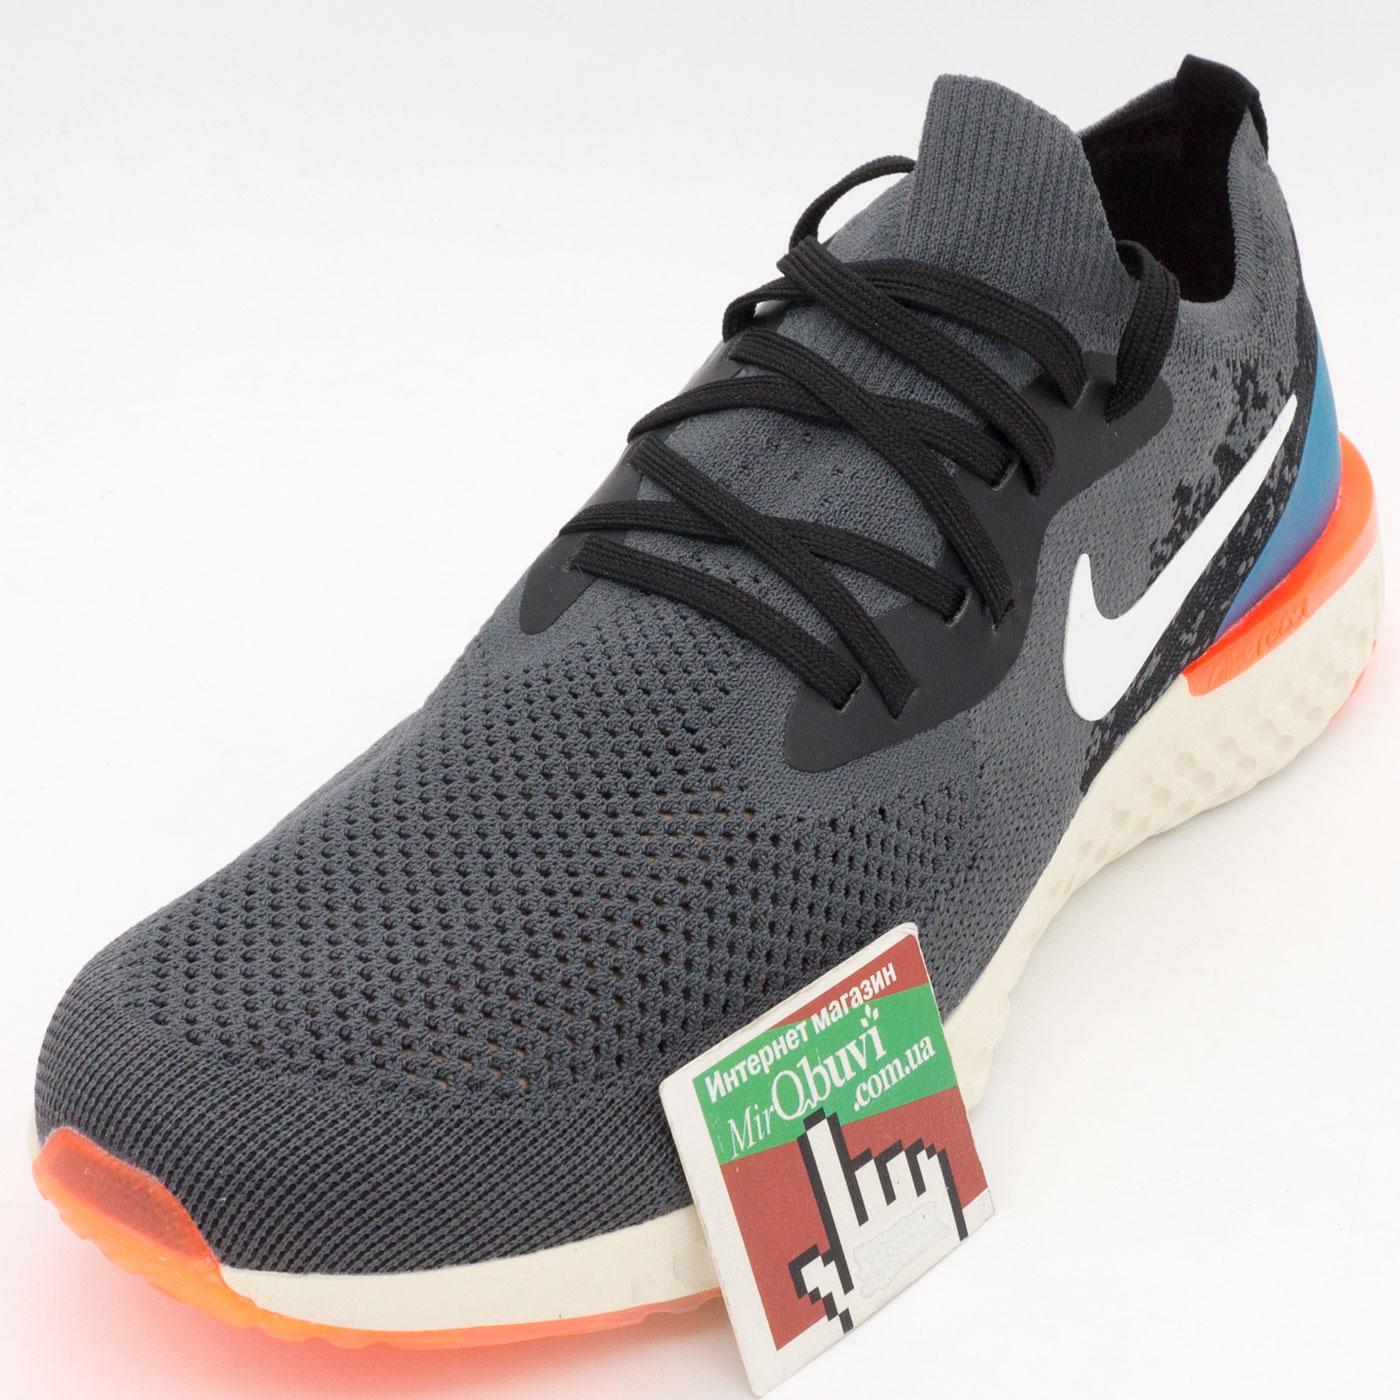 фото front Мужские кроссовки для бега Nike Epic React Flyknit пепел. Топ качество! front